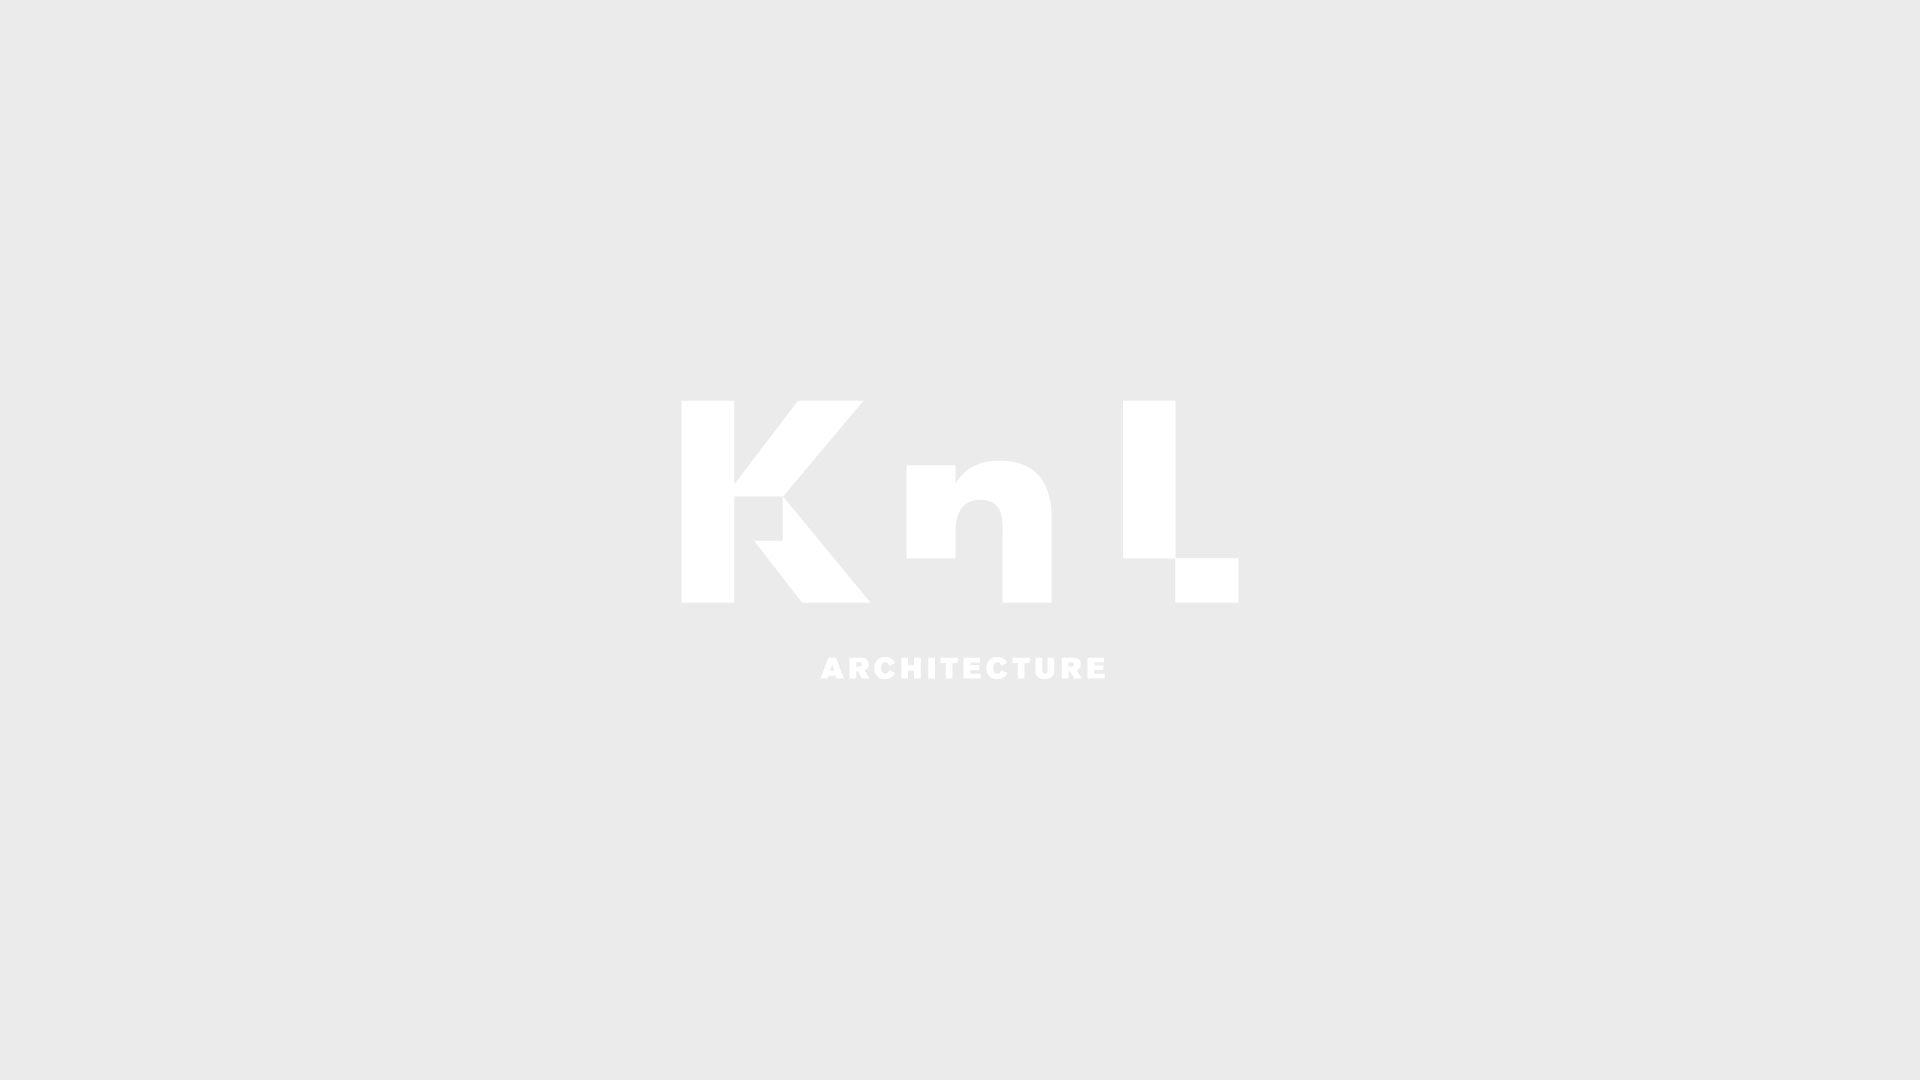 Logotype en négatif